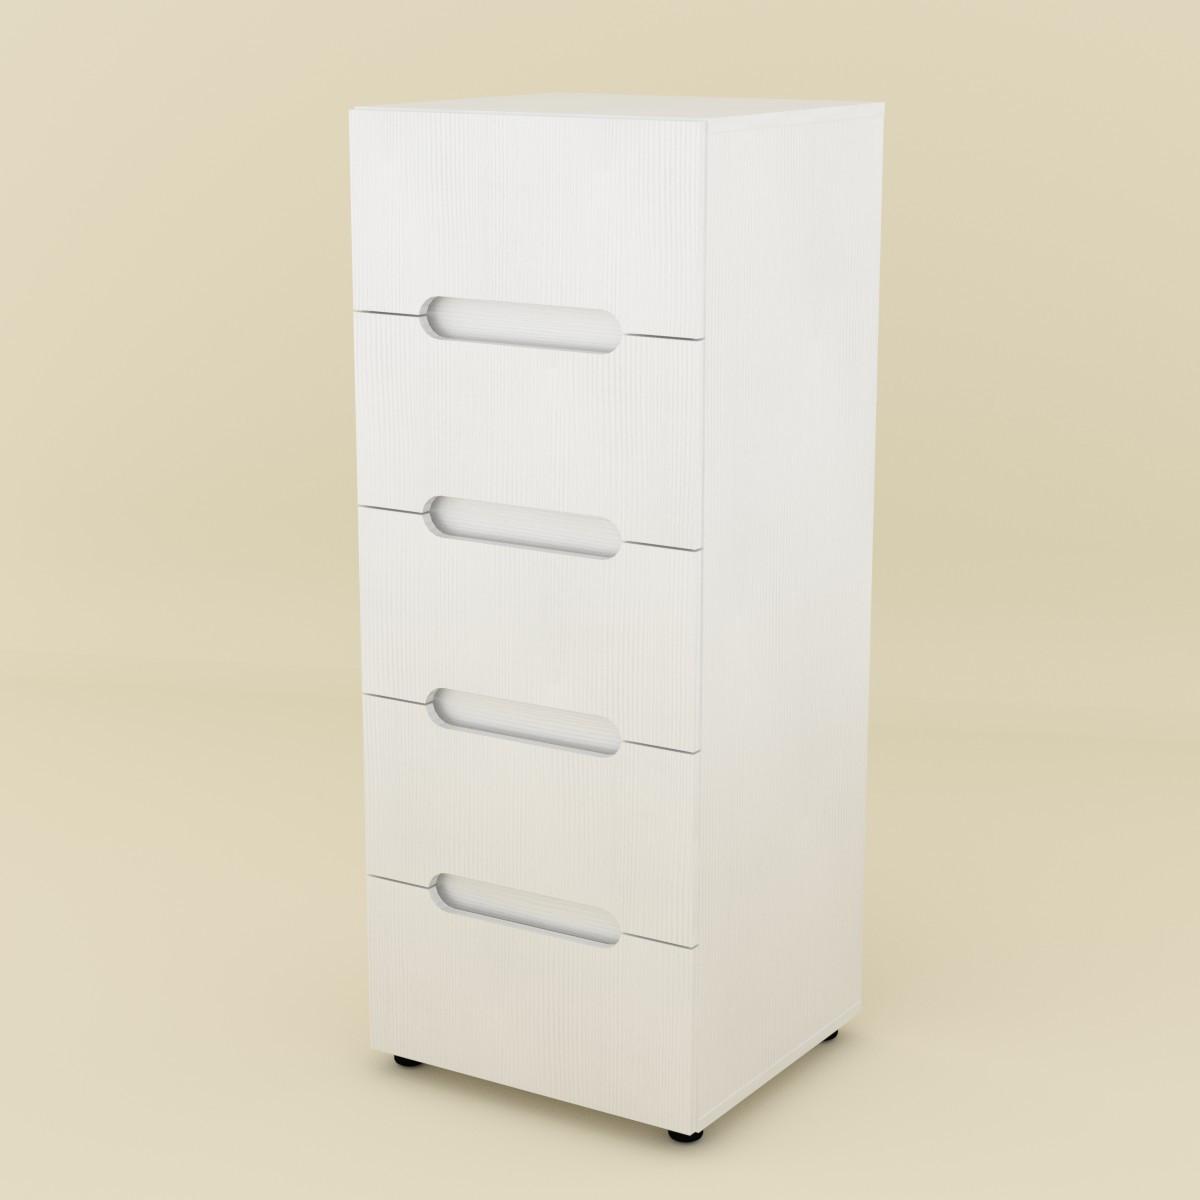 Комод МС-8 белый Компанит (50х46х127 см)